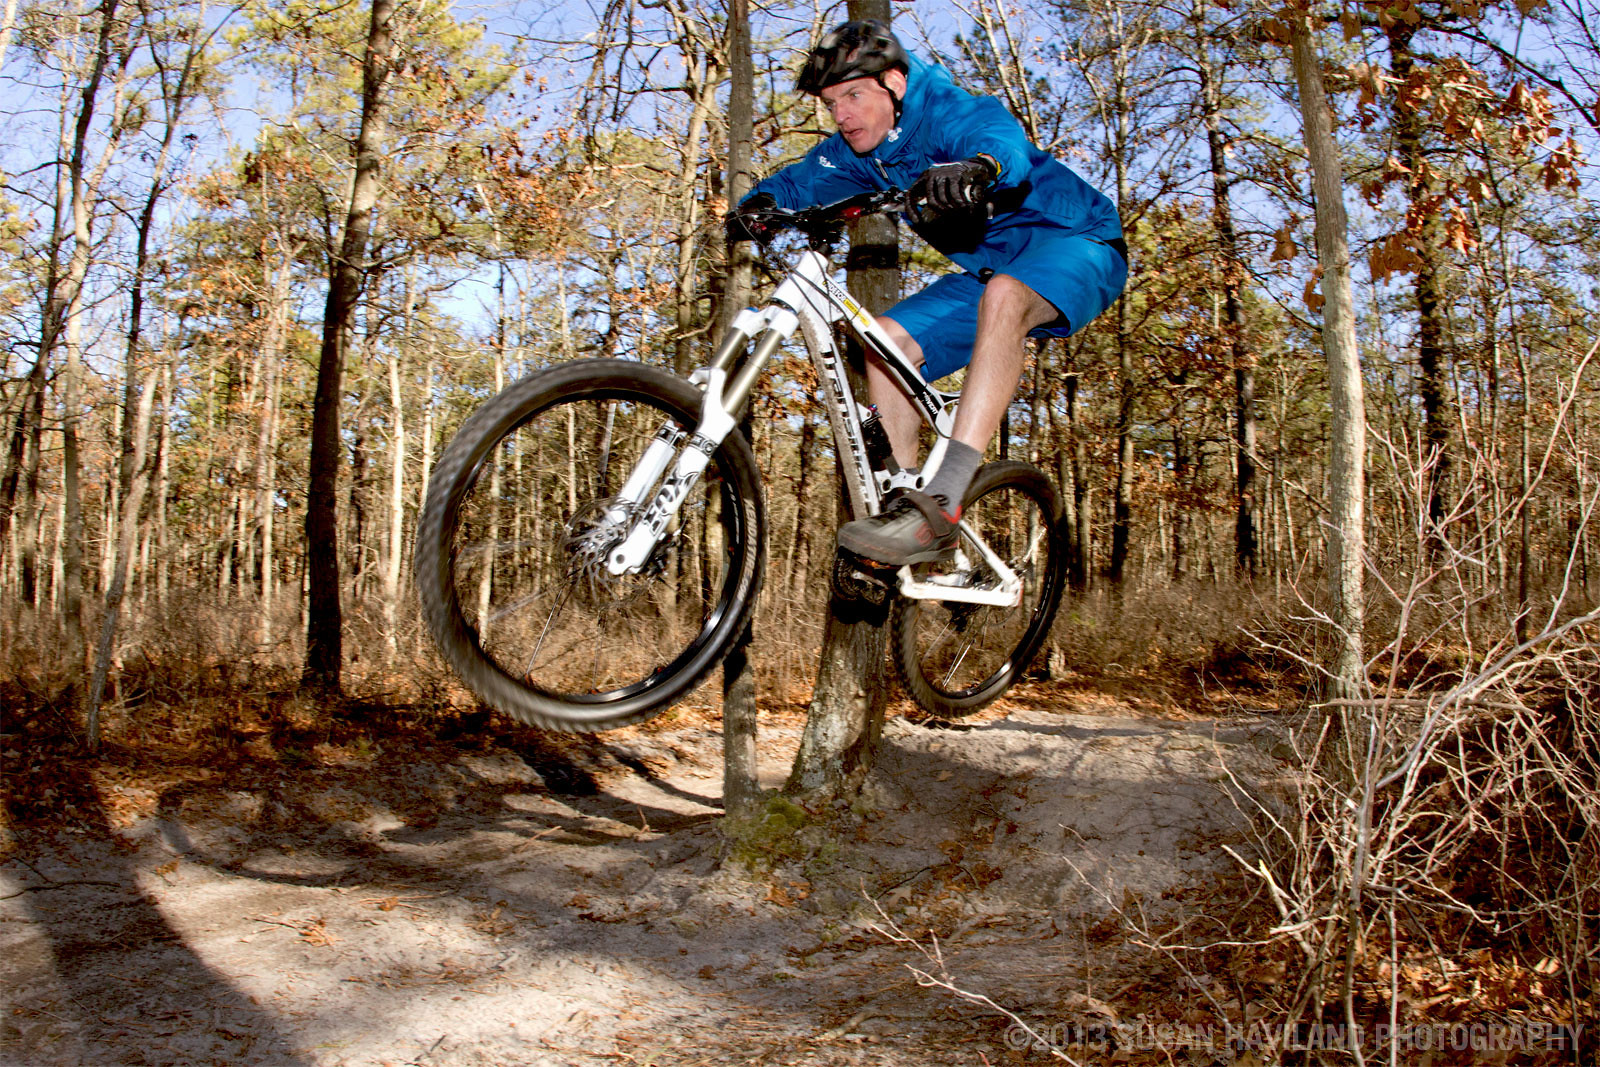 Seaview Trails Galloway, NJ - gerrycreighton - Mountain Biking Pictures - Vital MTB